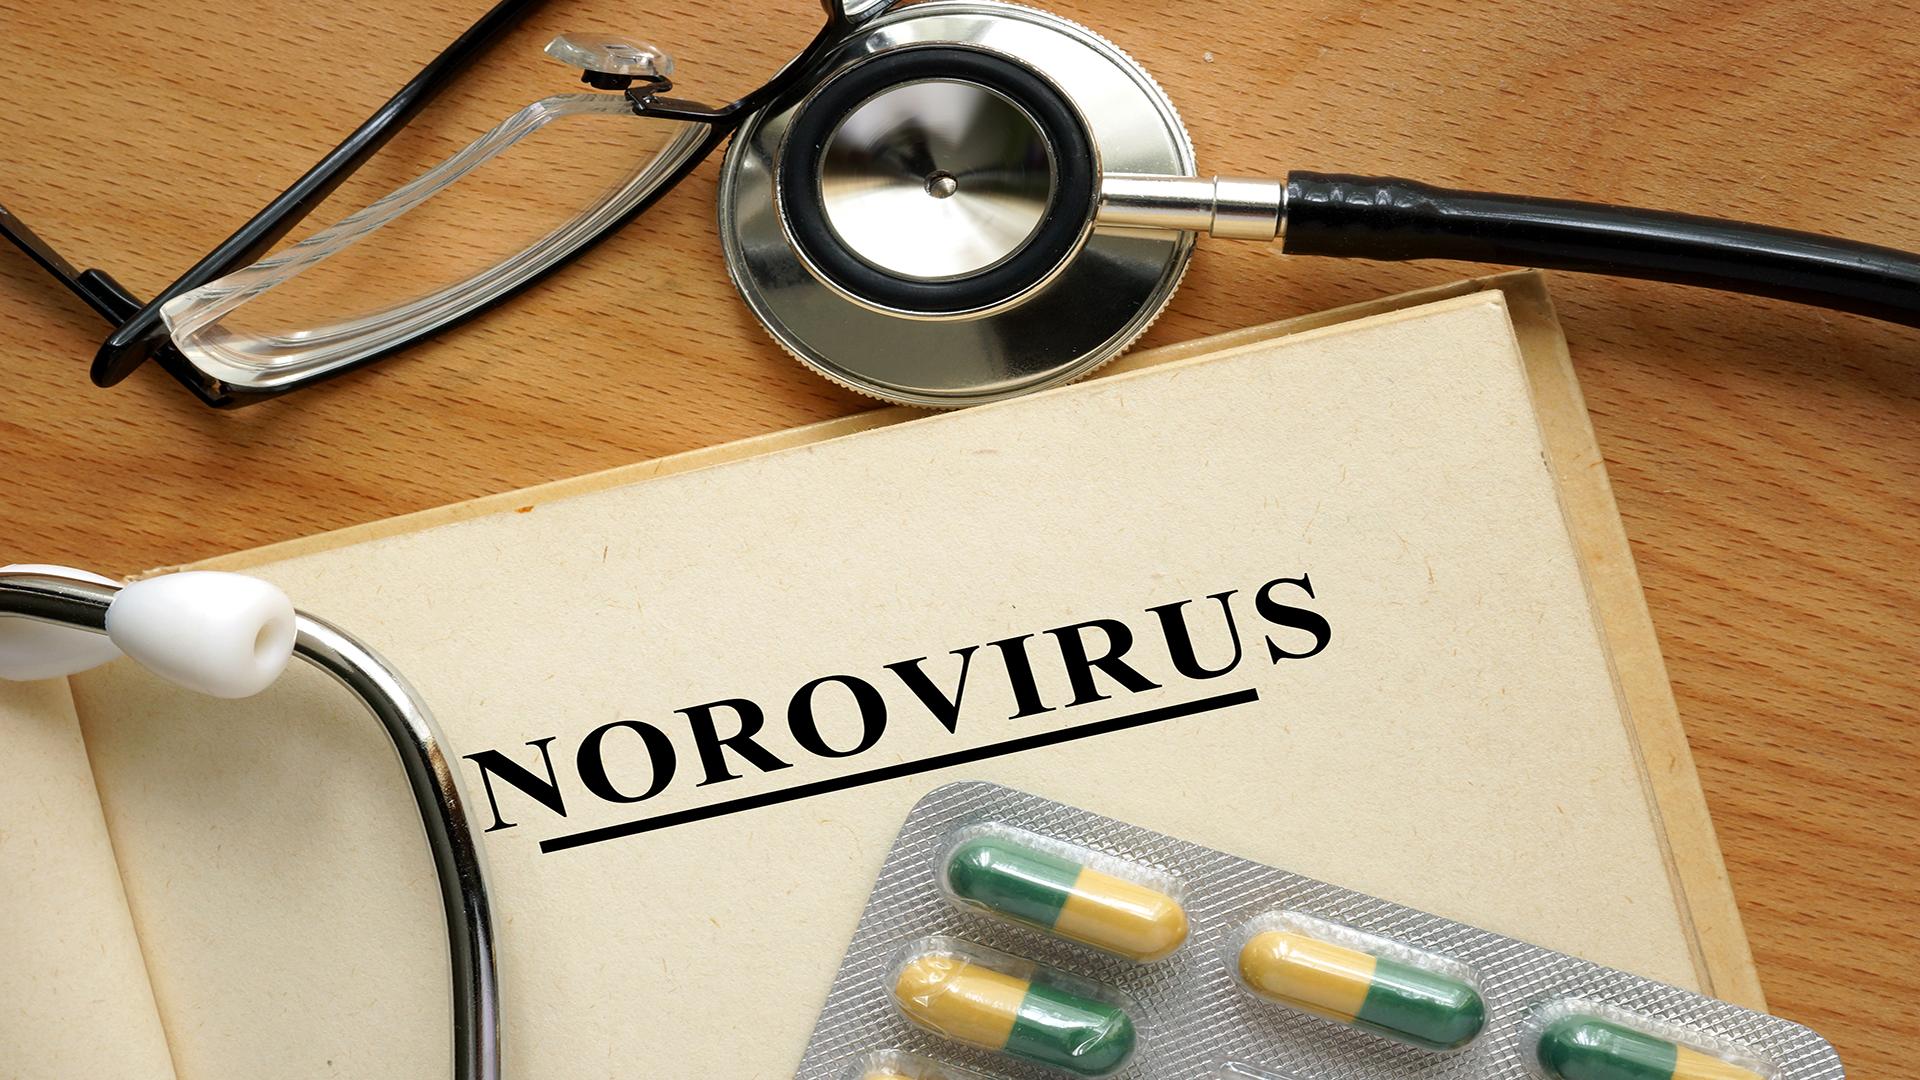 Norovirus - (Getty Images Premium access)